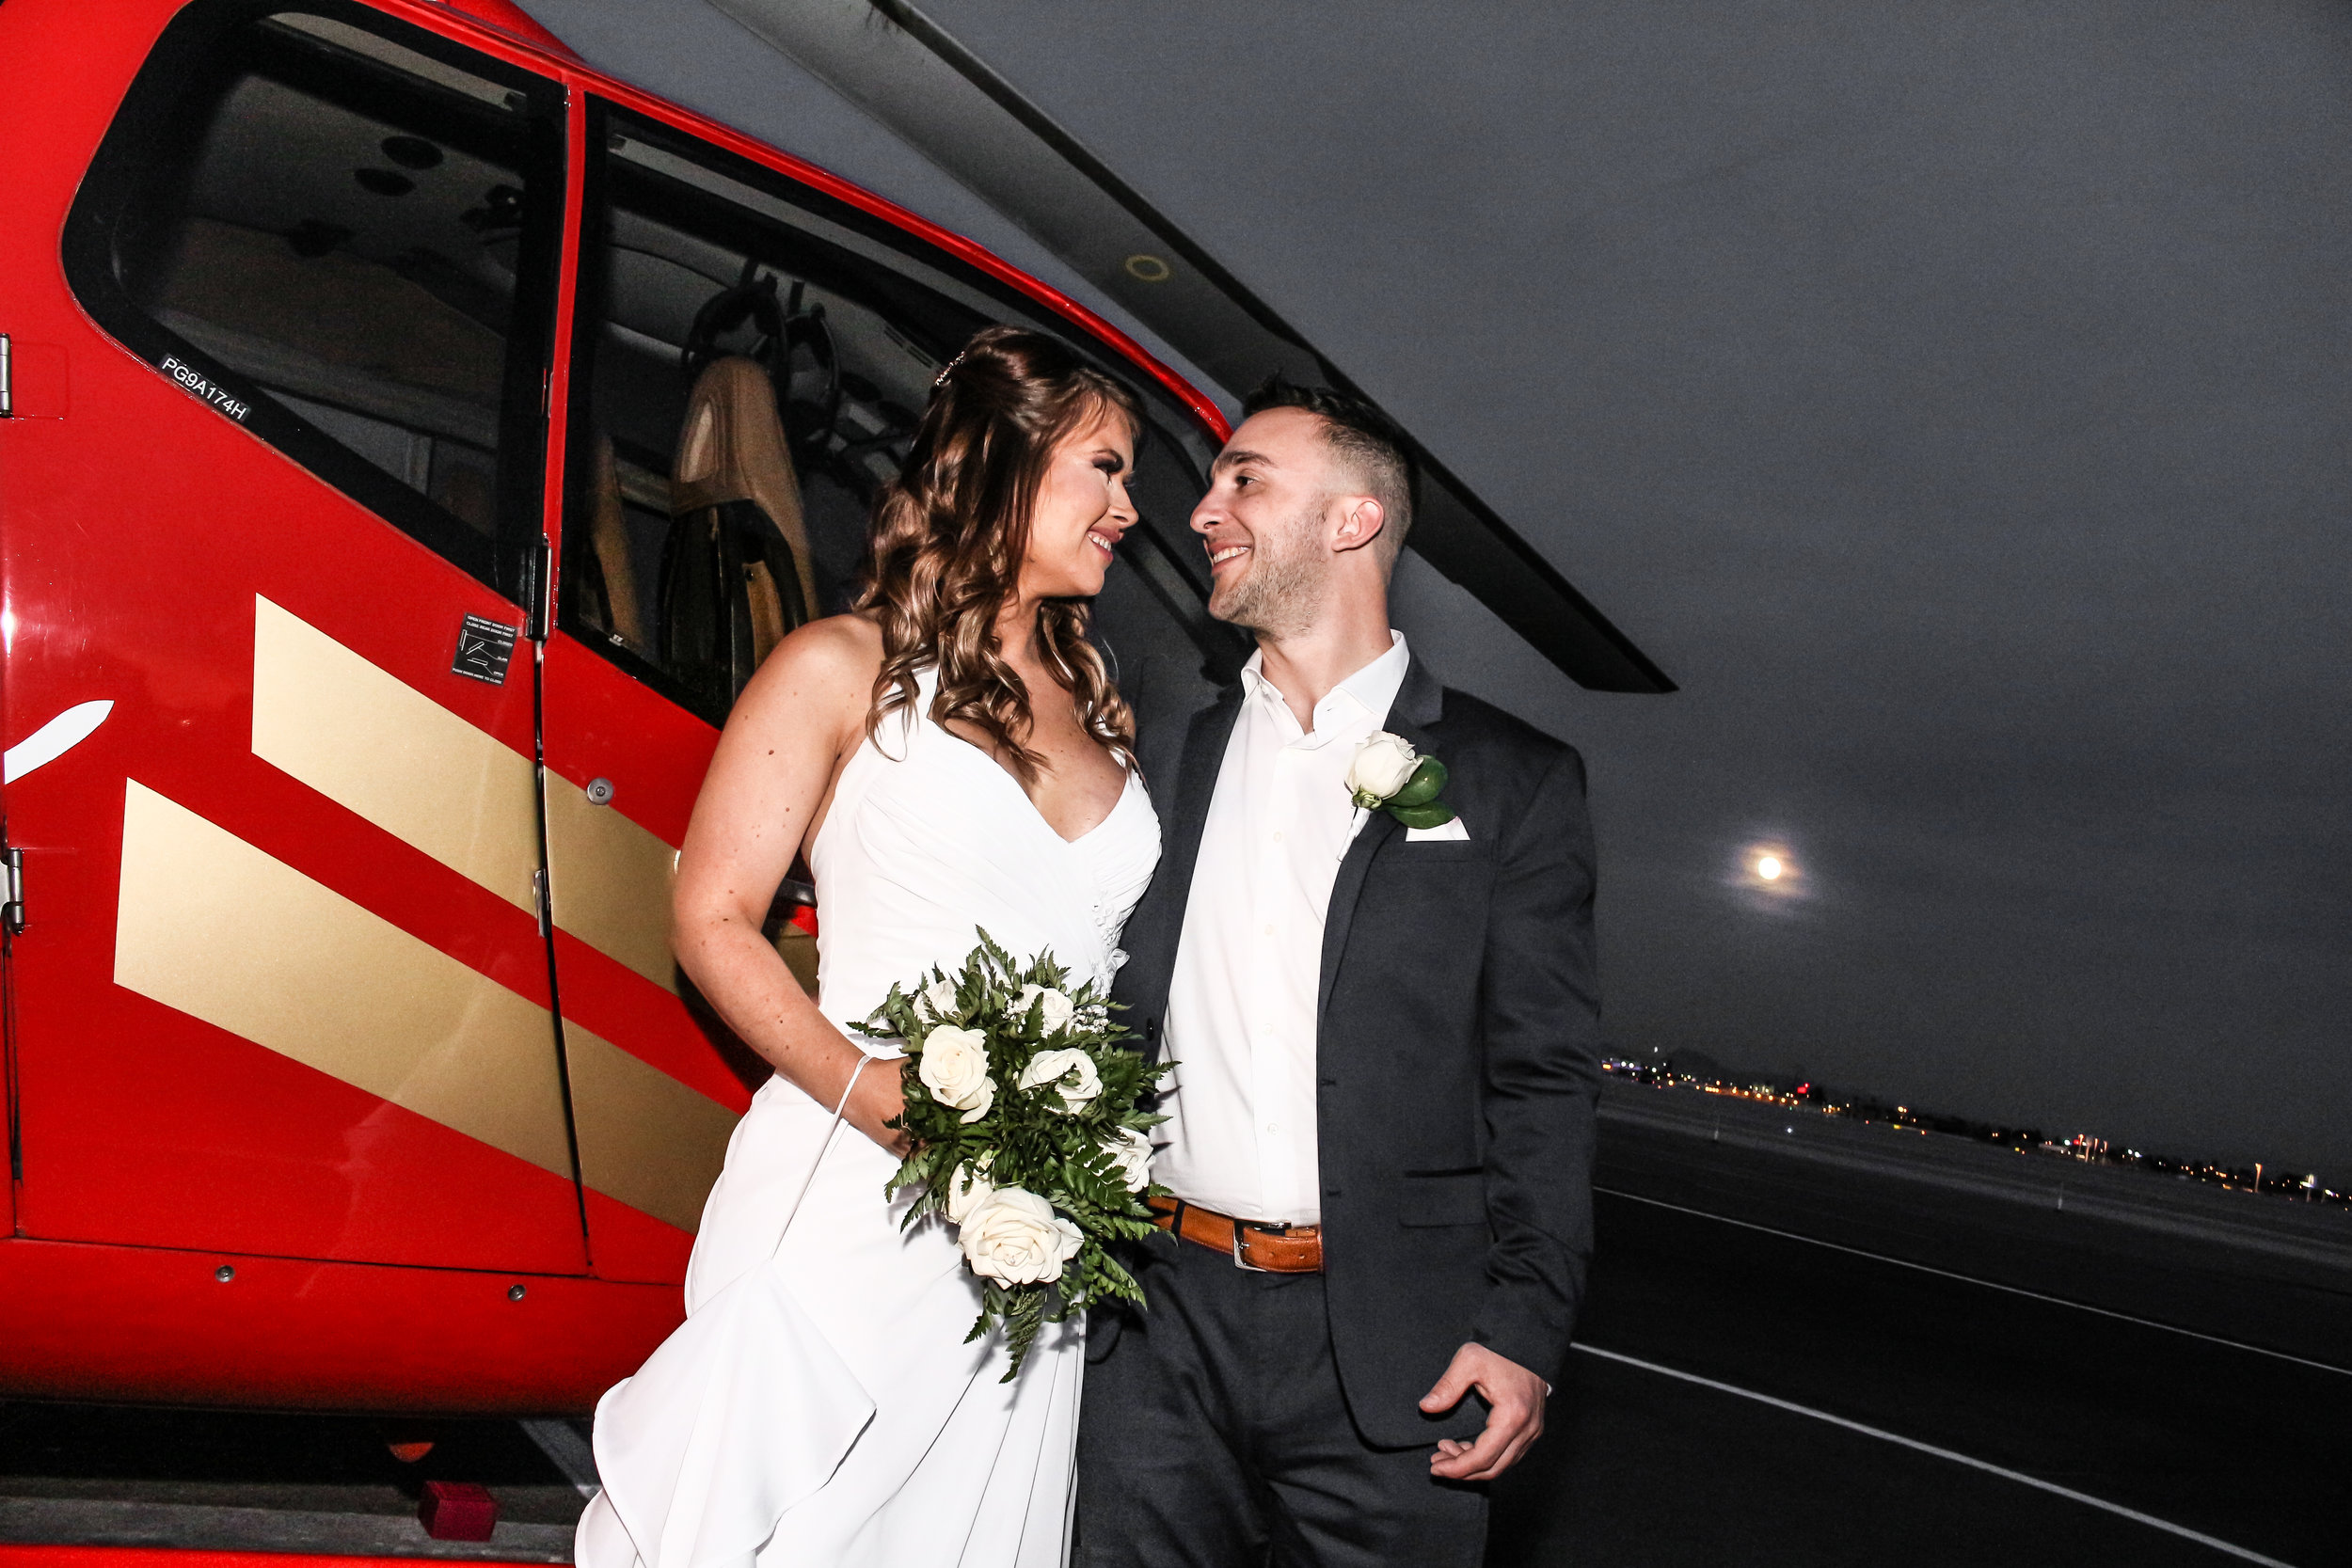 Helicoper wedding in Vegas